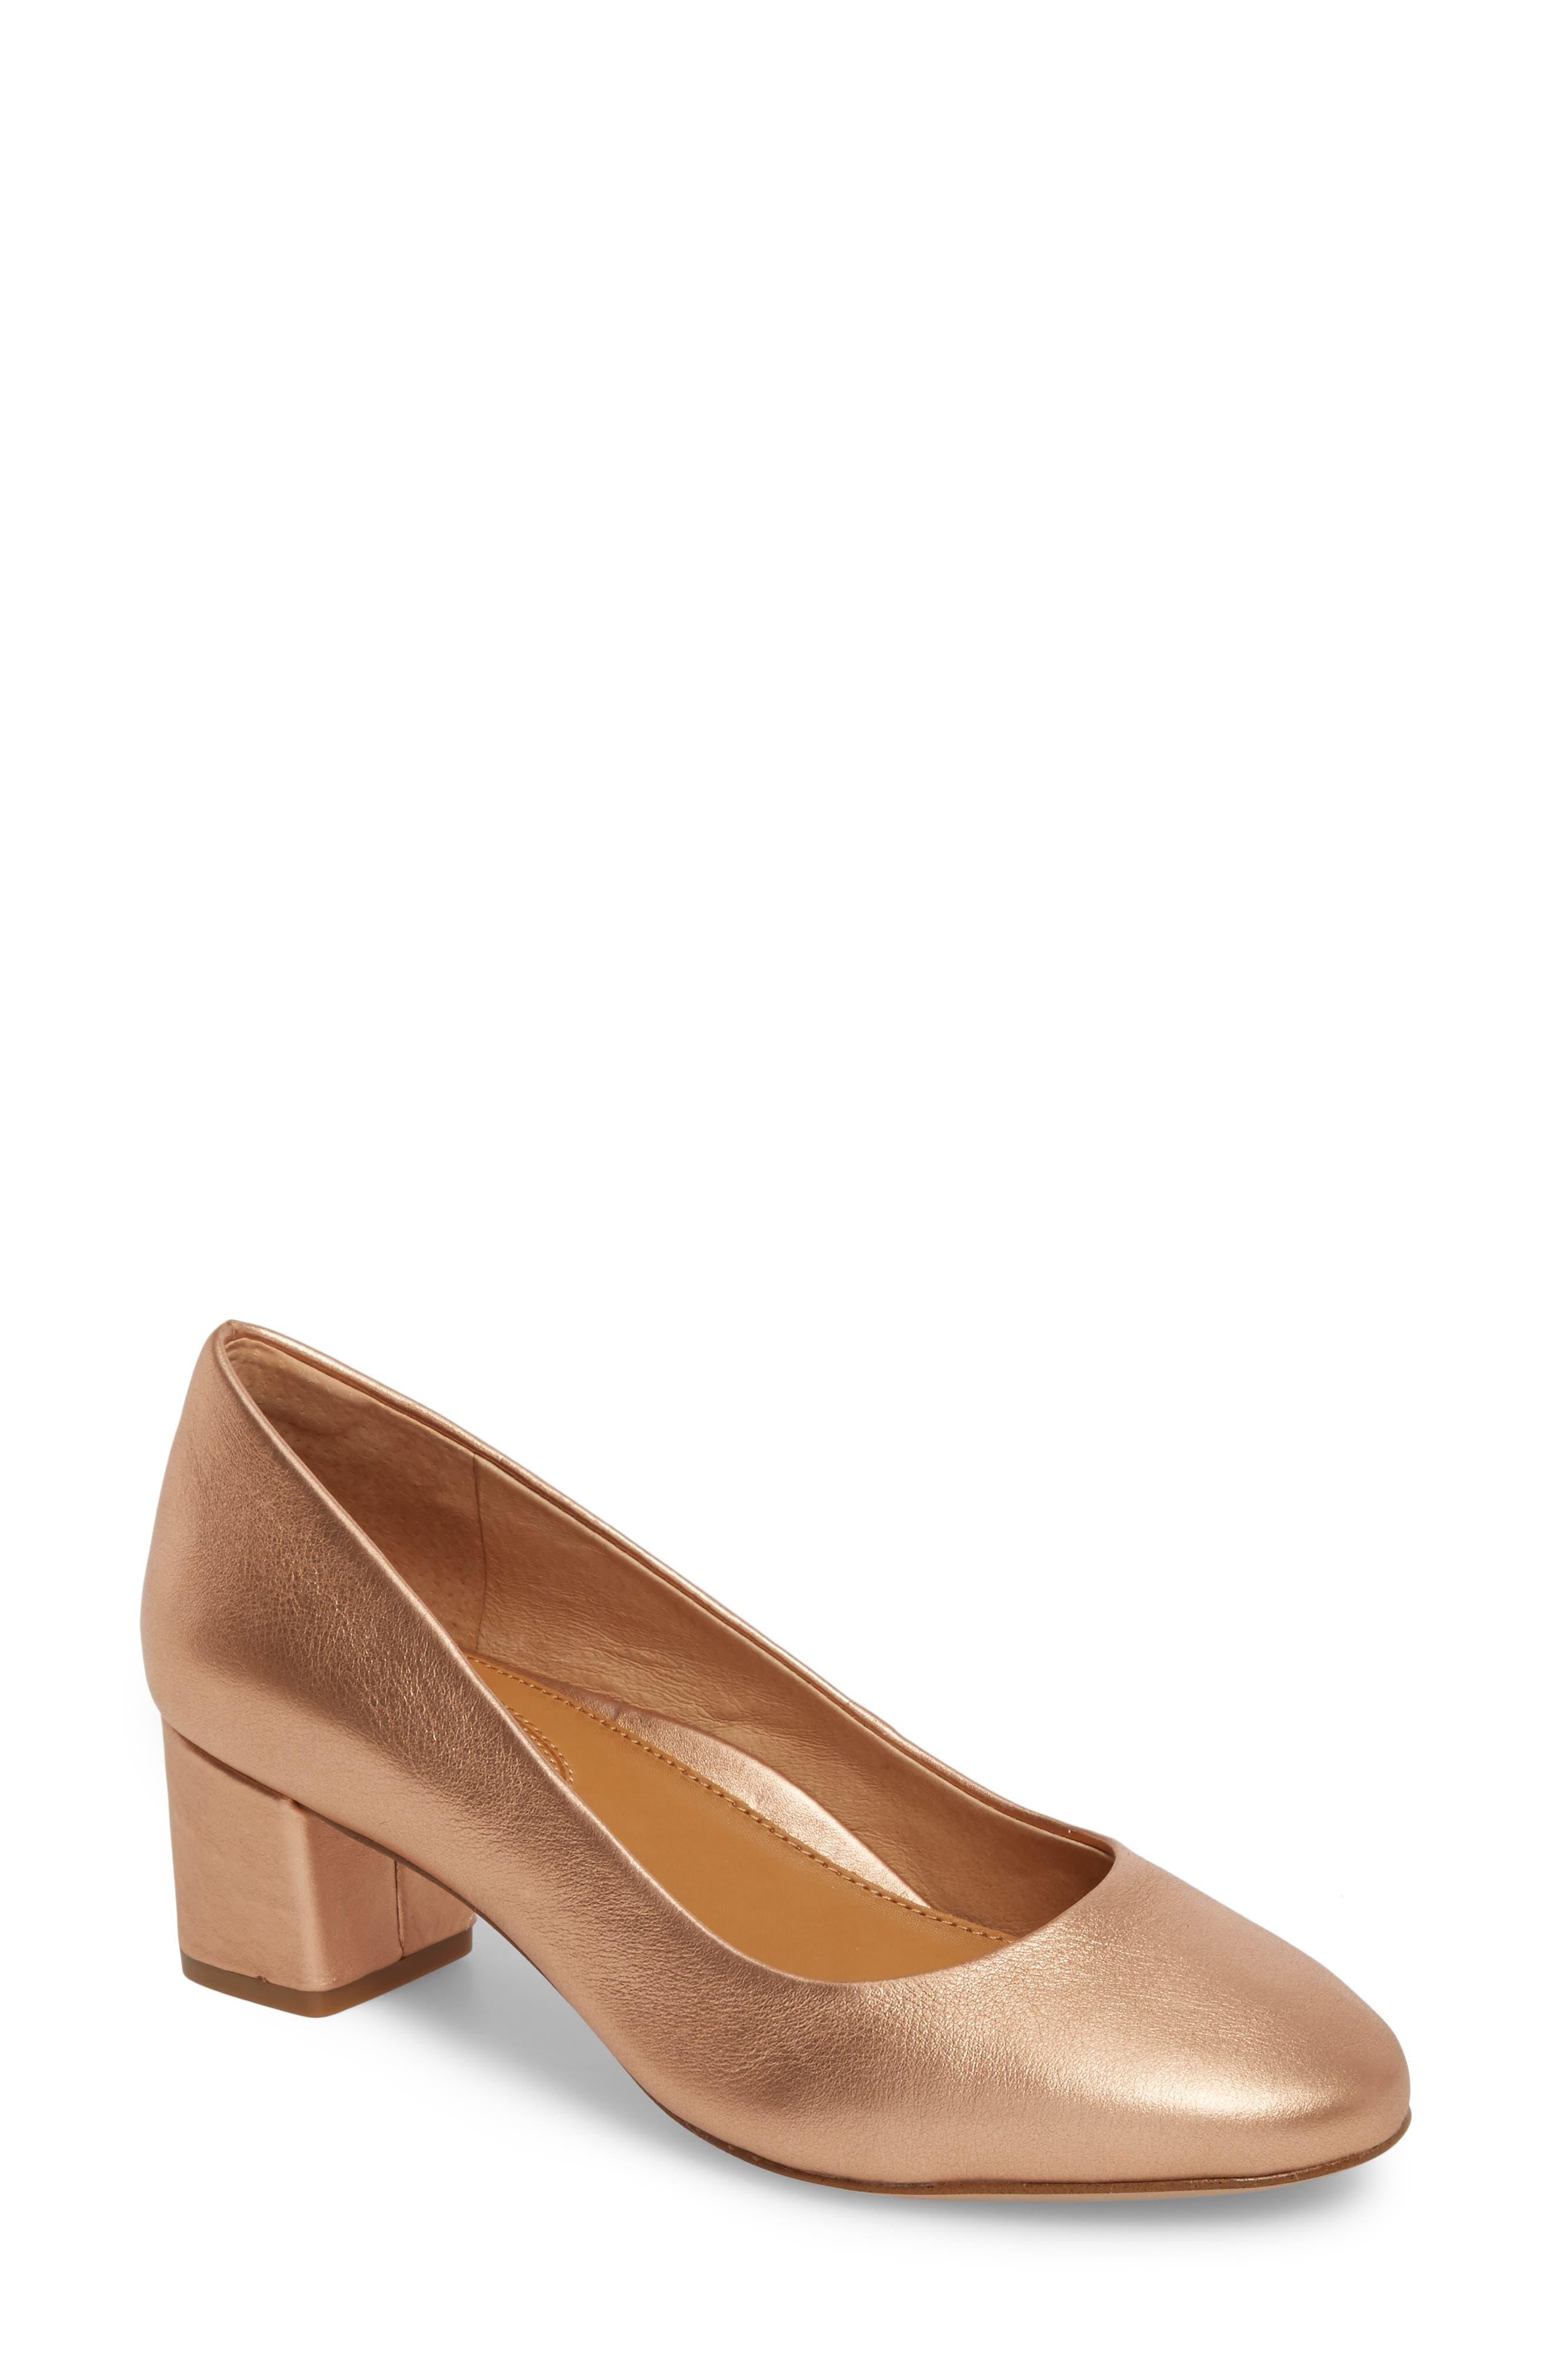 Gwynn Block Heel Pump,                         Main,                         color, Rose Gold Leather